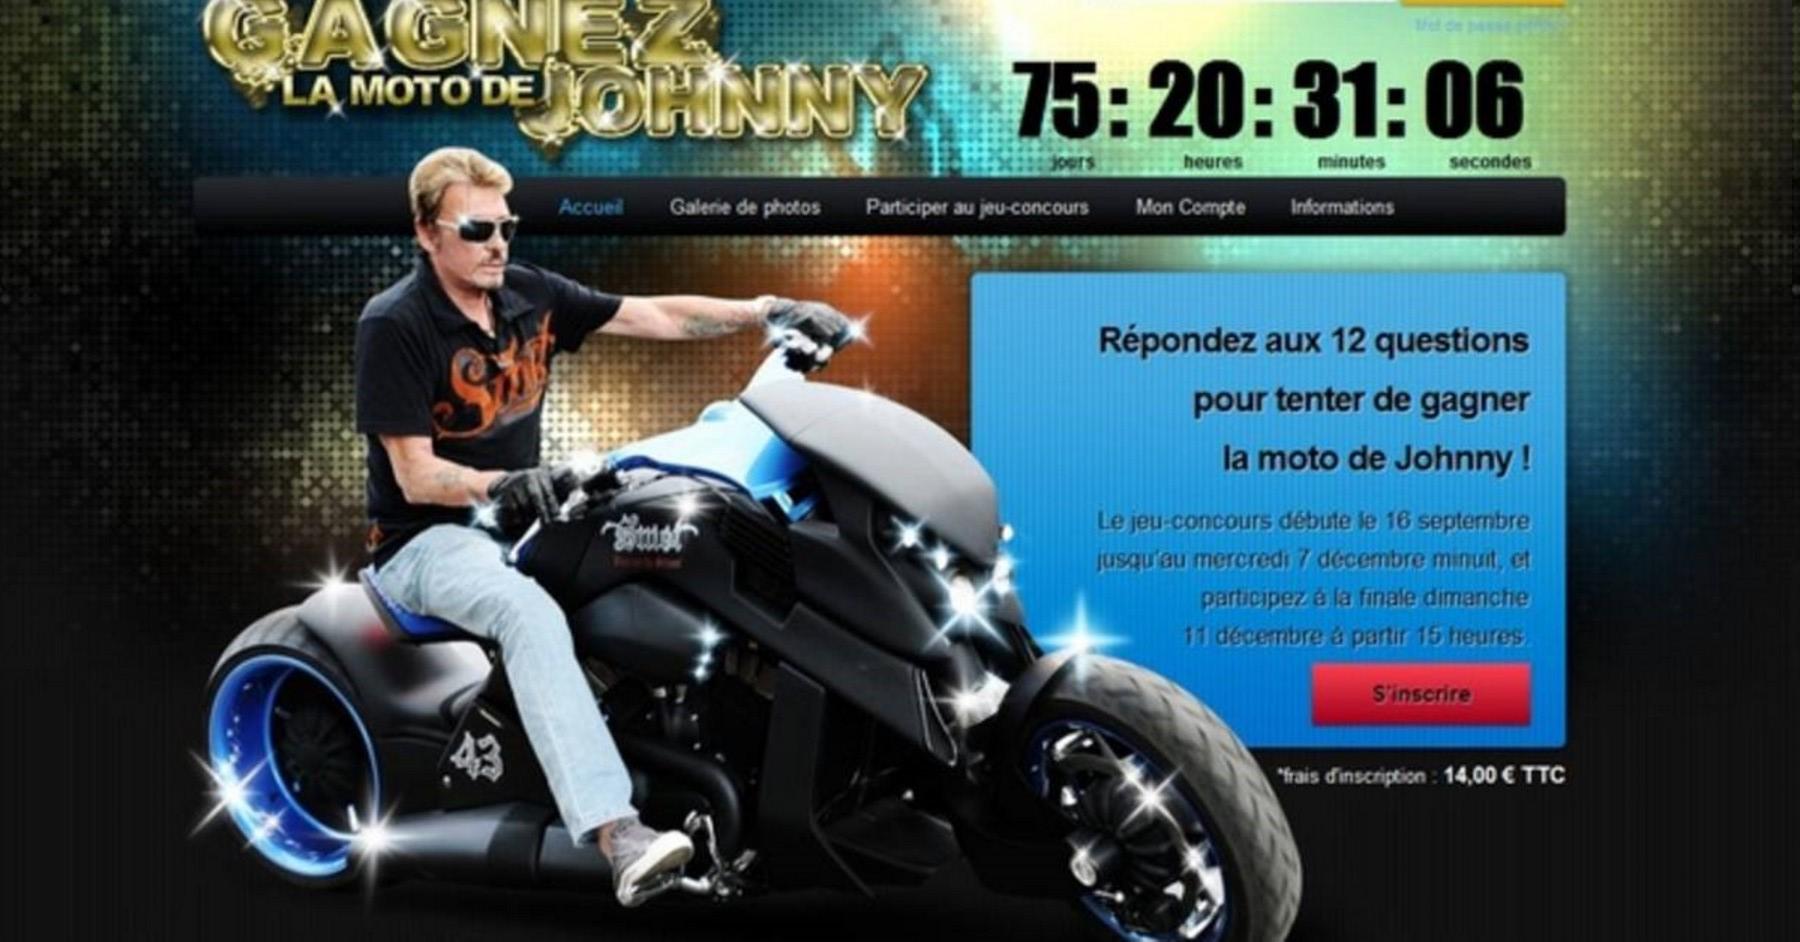 TRAVERTSON V-REX DE JOHNNY HALLYDAY ( 2008 ) Images24